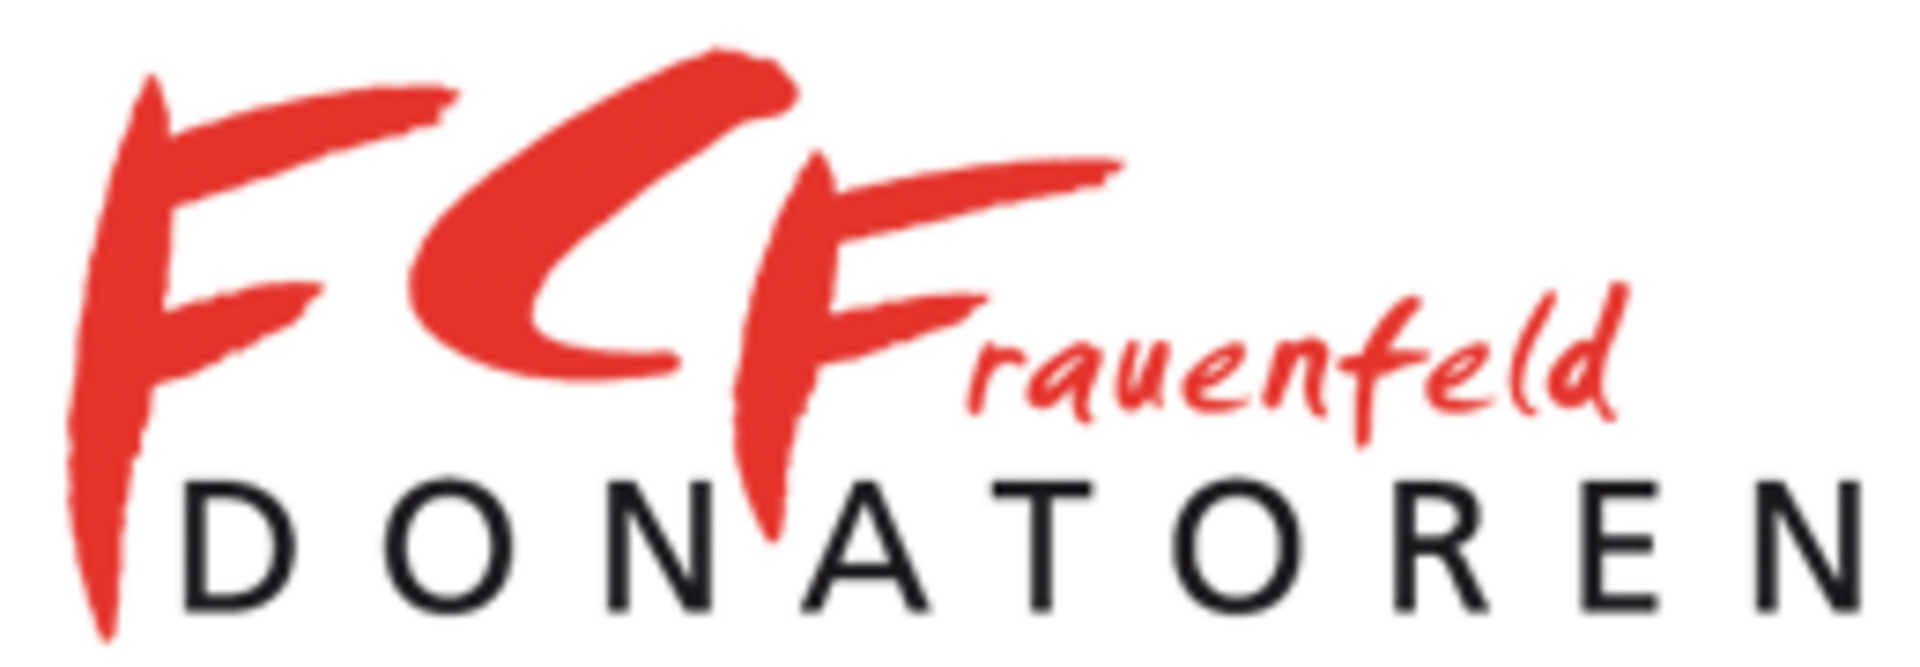 Donatoren | FC Frauenfeld